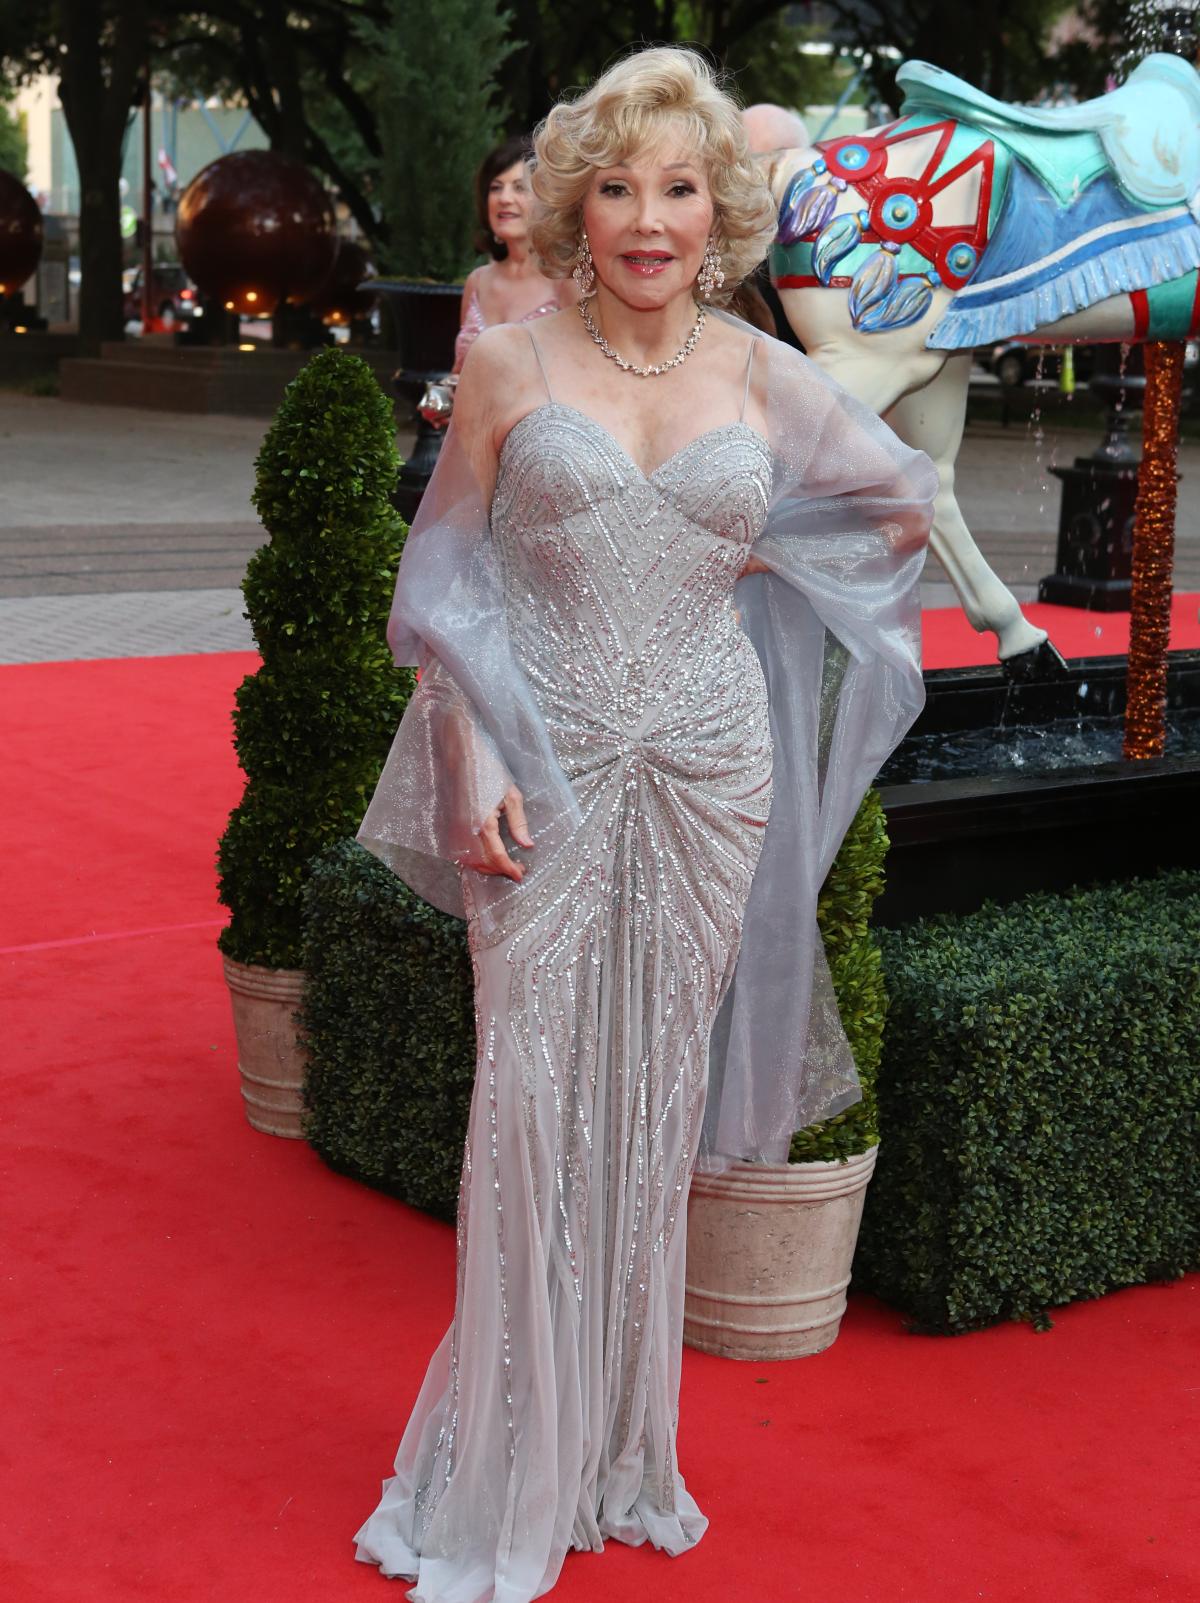 Houston, Opera Ball Gowns, April 2016, Joanne Herring in Faviana.